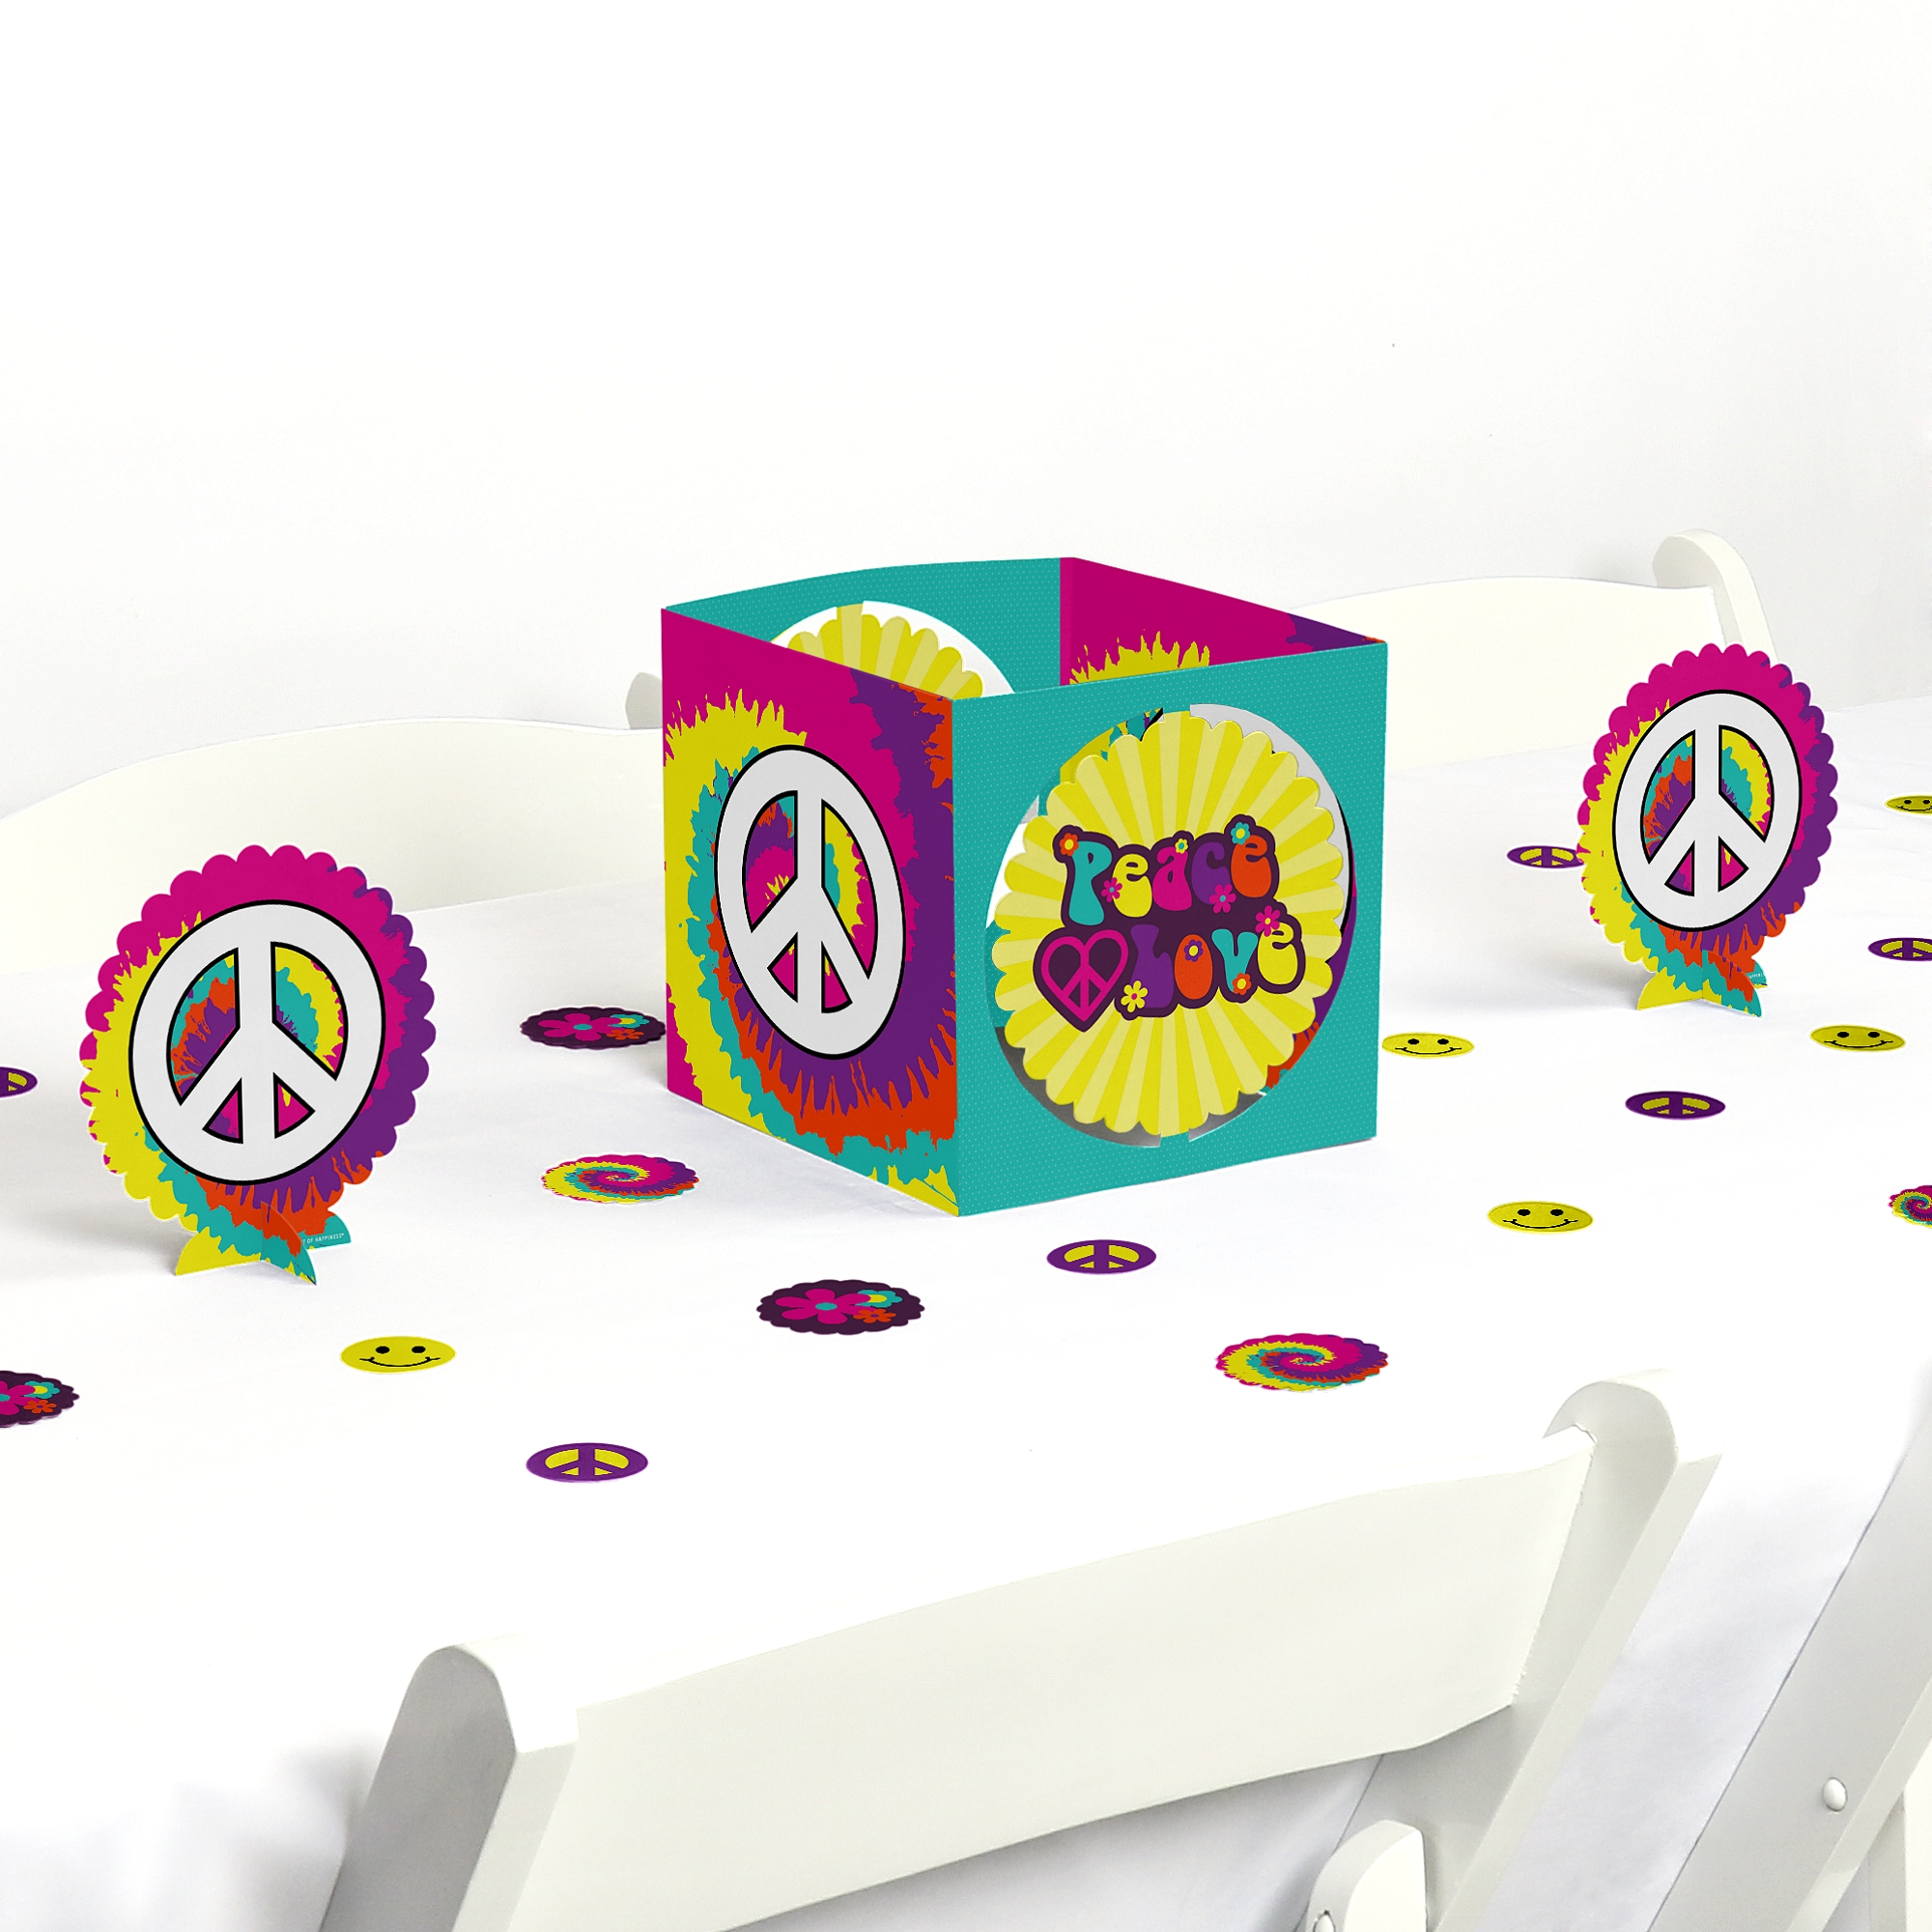 60 S Hippie 1960s Groovy Party Centerpiece Table Decoration Kit Walmart Com Walmart Com